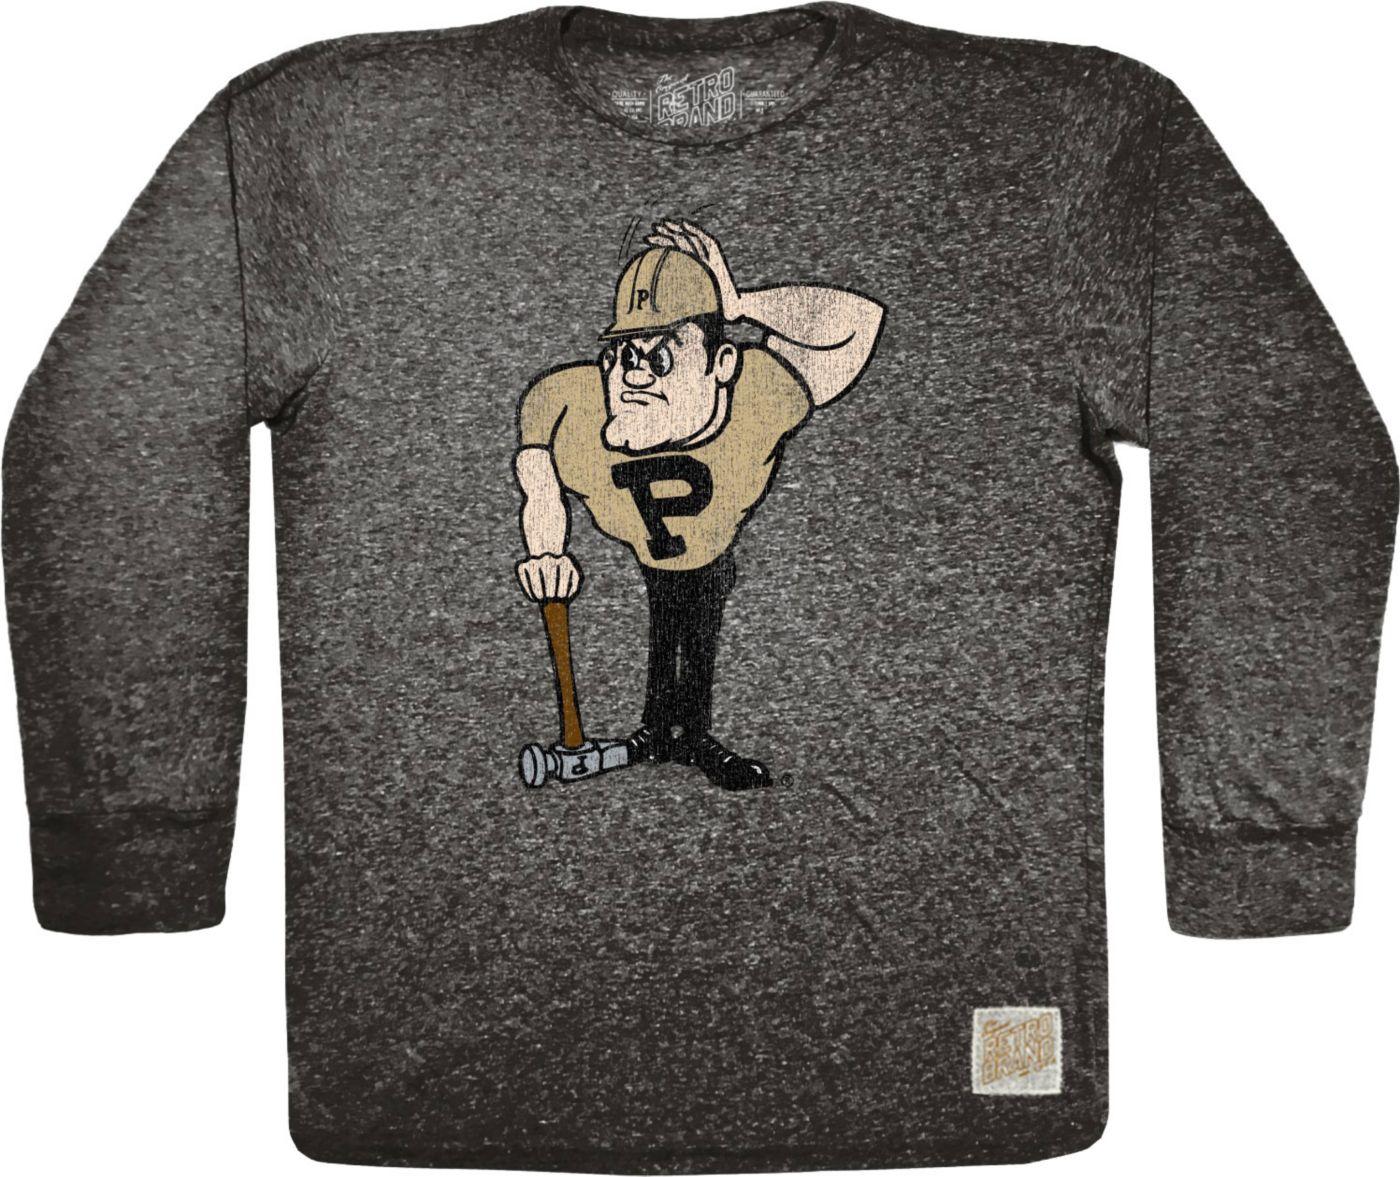 Original Retro Brand Men's Purdue Boilermakers Tri-Blend Long Sleeve Black T-Shirt